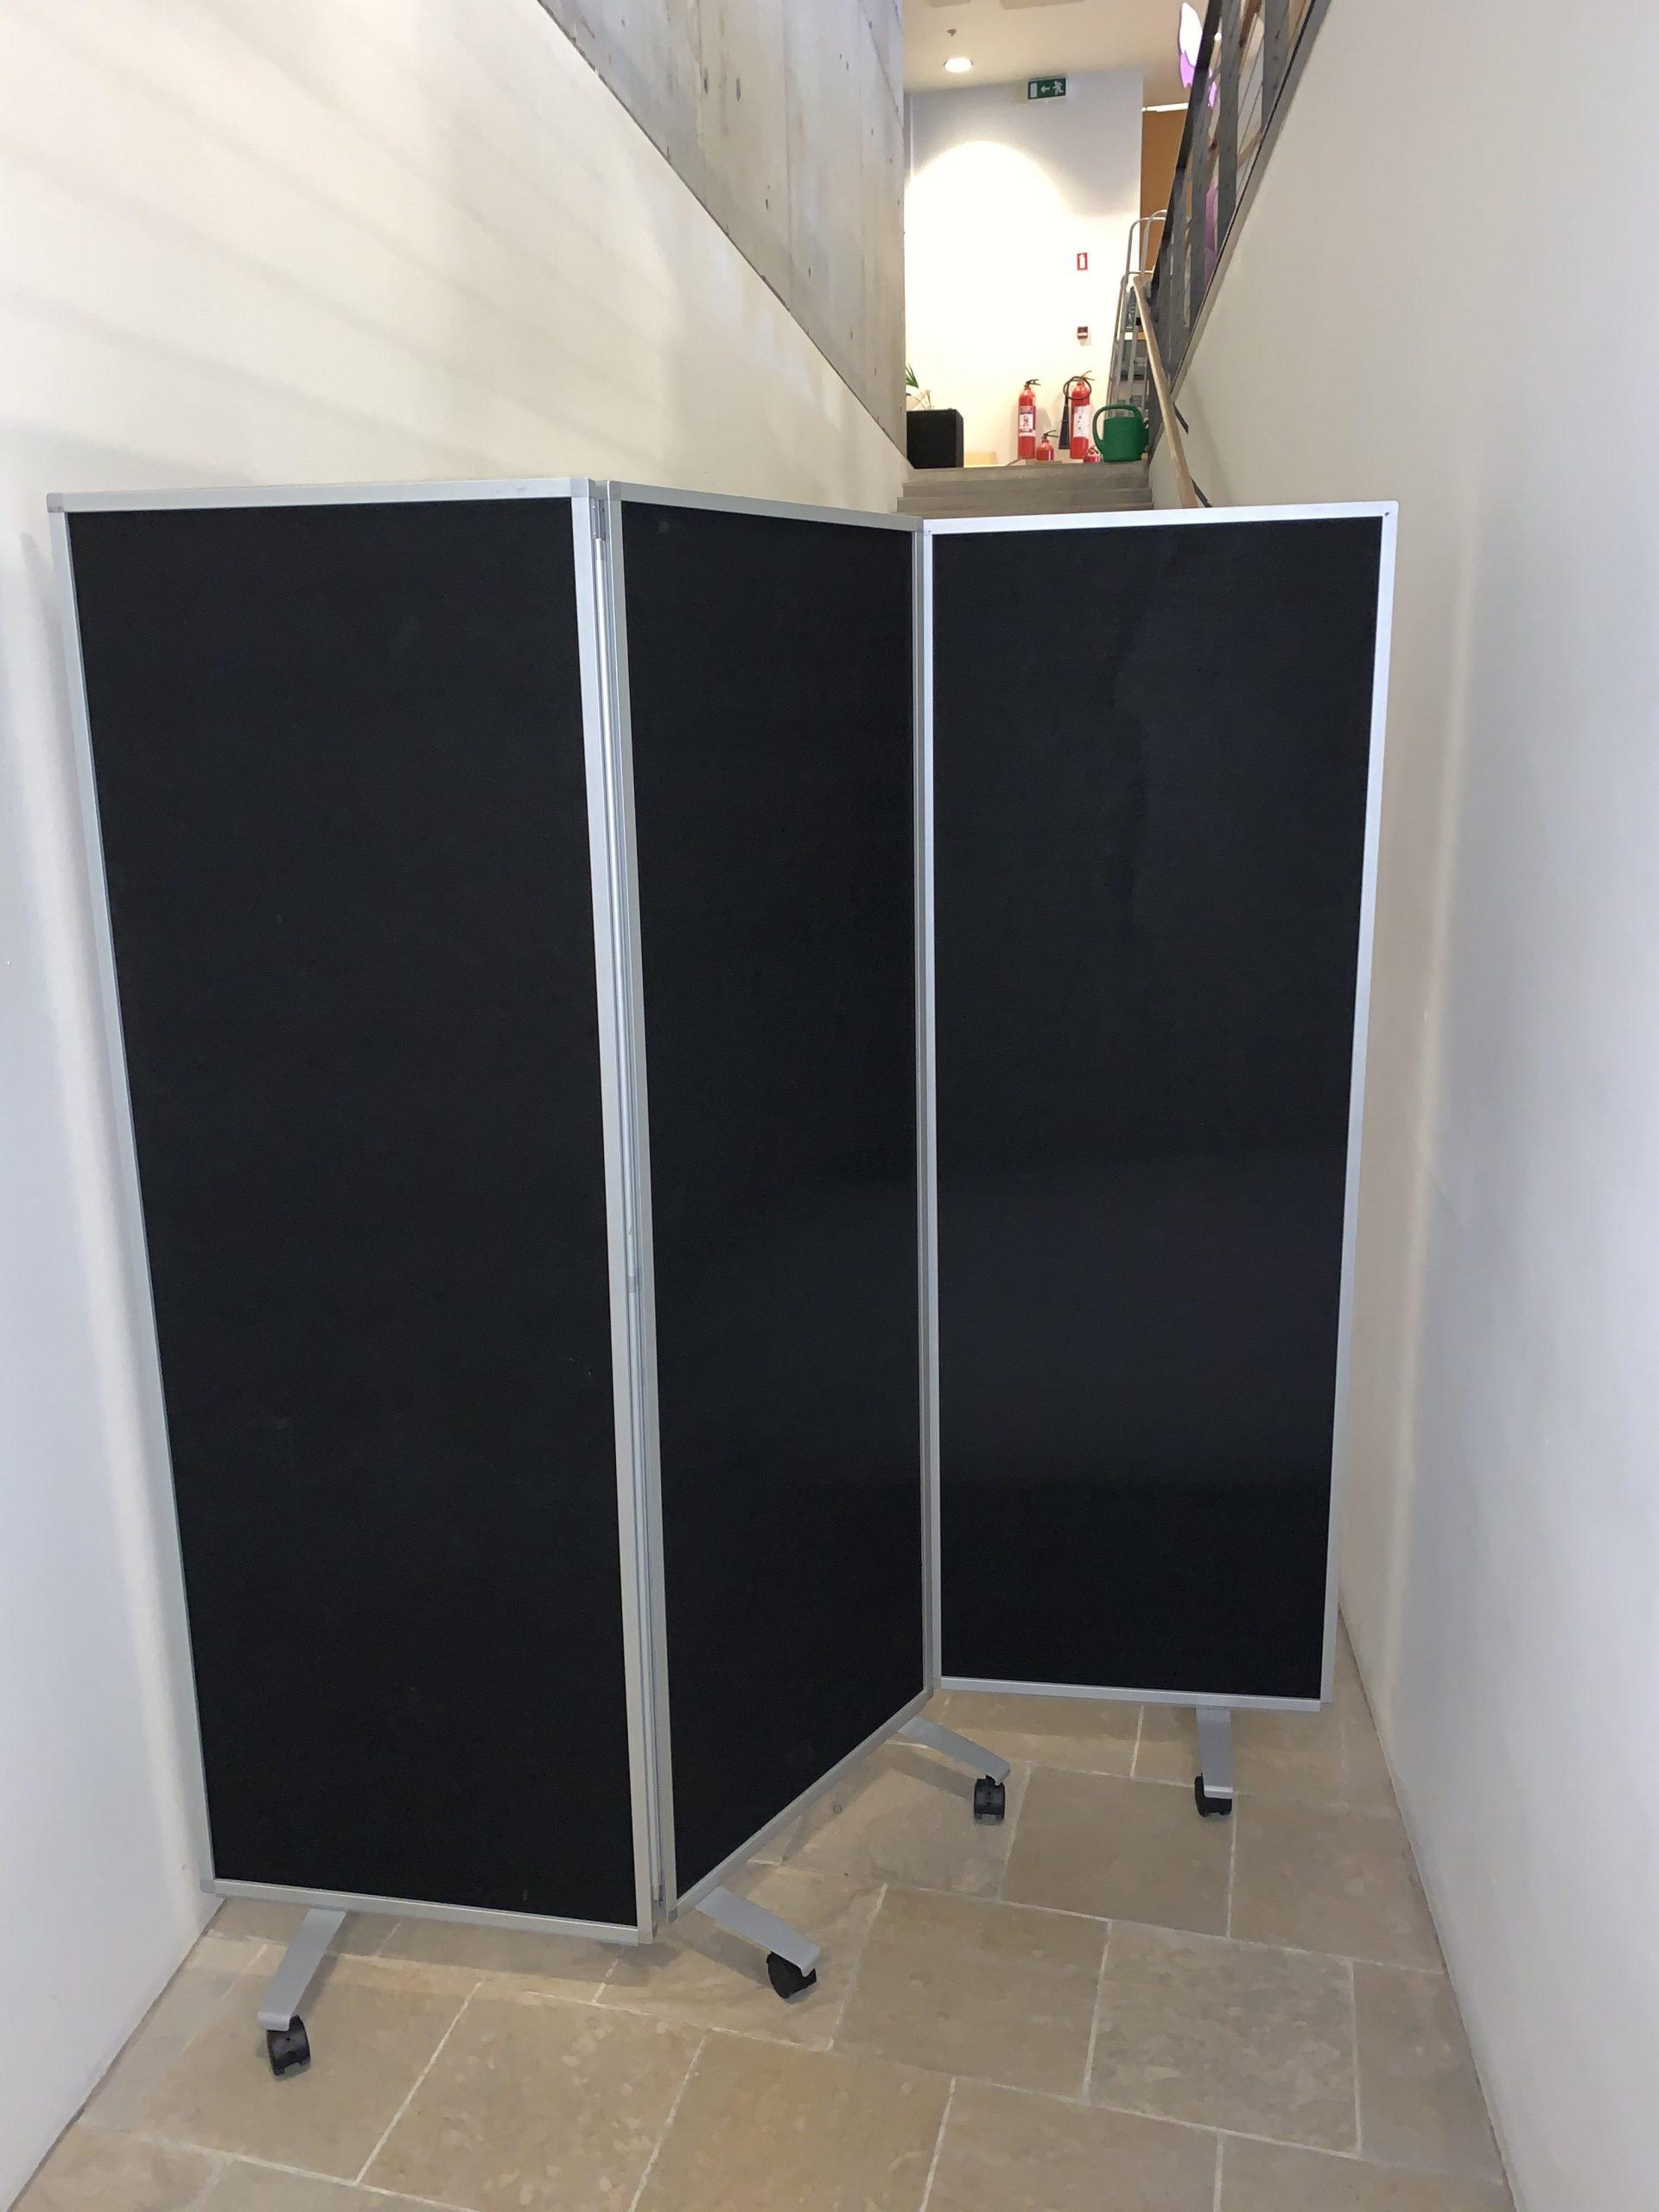 Room divider (wheels), 3 panel, Black / Silver, 180 x 180 x 40